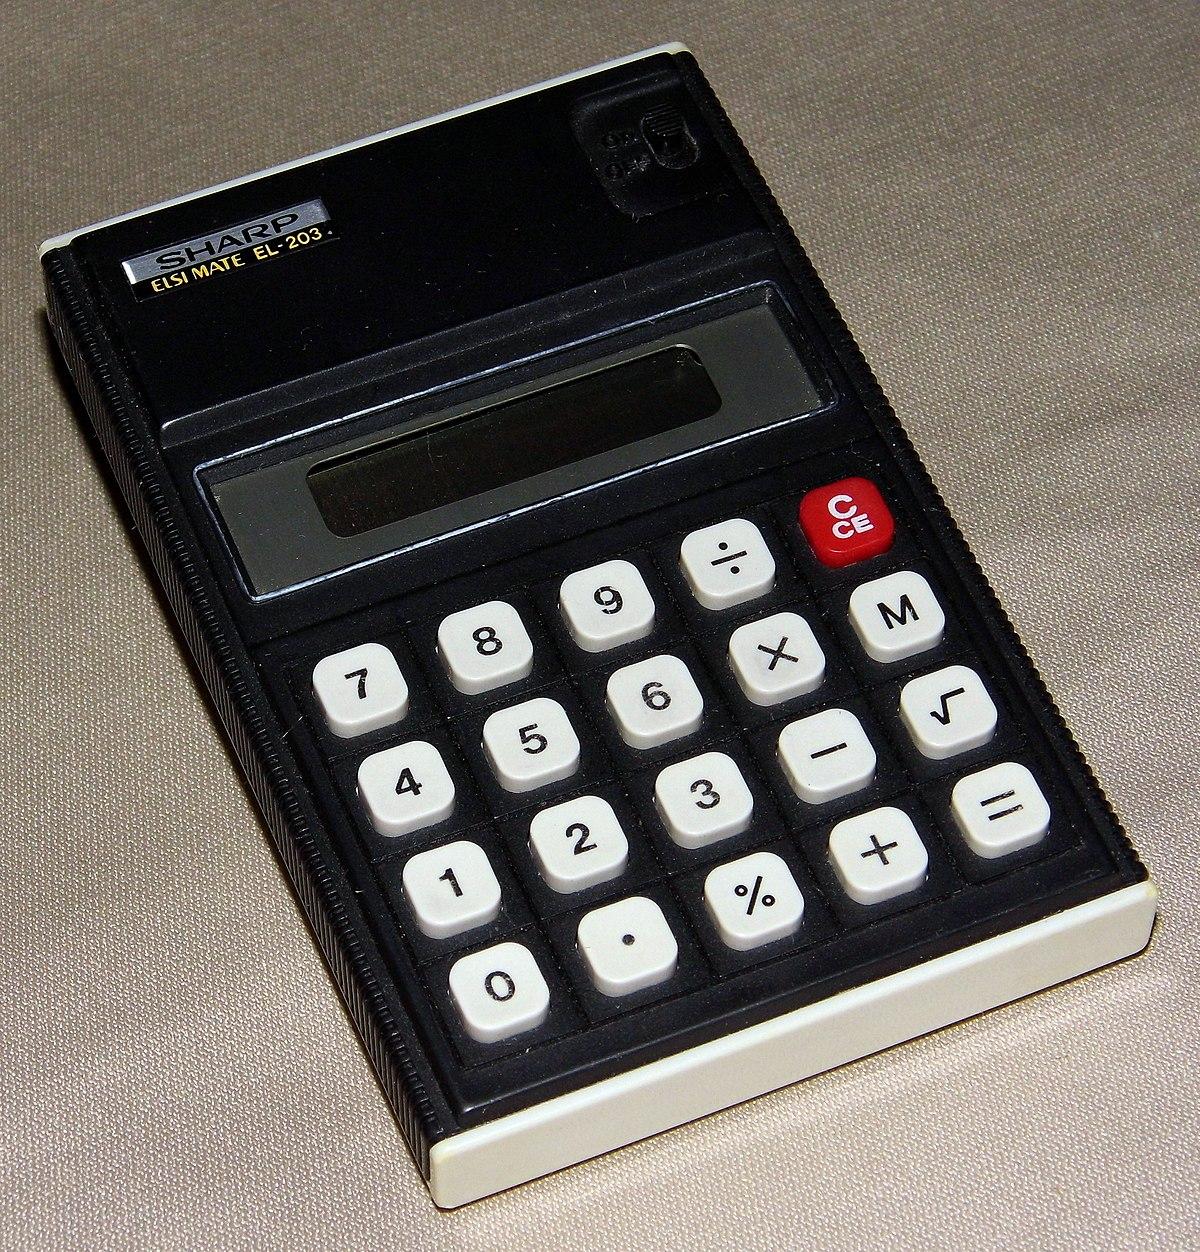 % Calculator